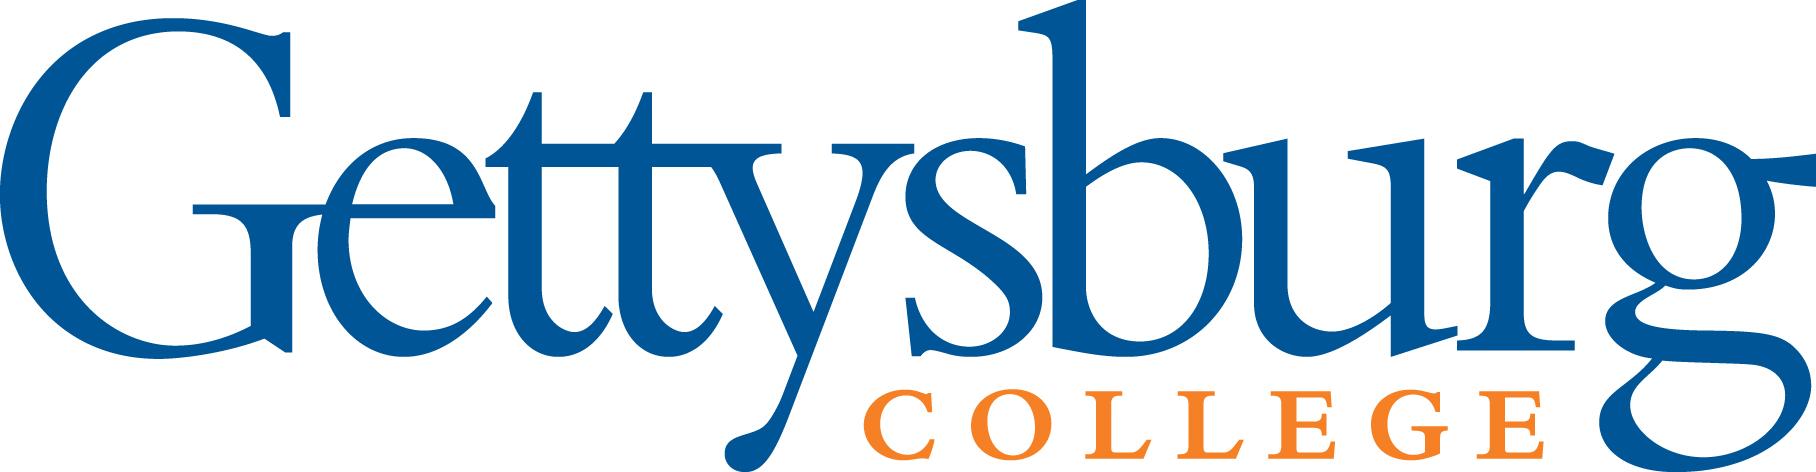 Gettysburg College Blue and Orange Logo.jpg